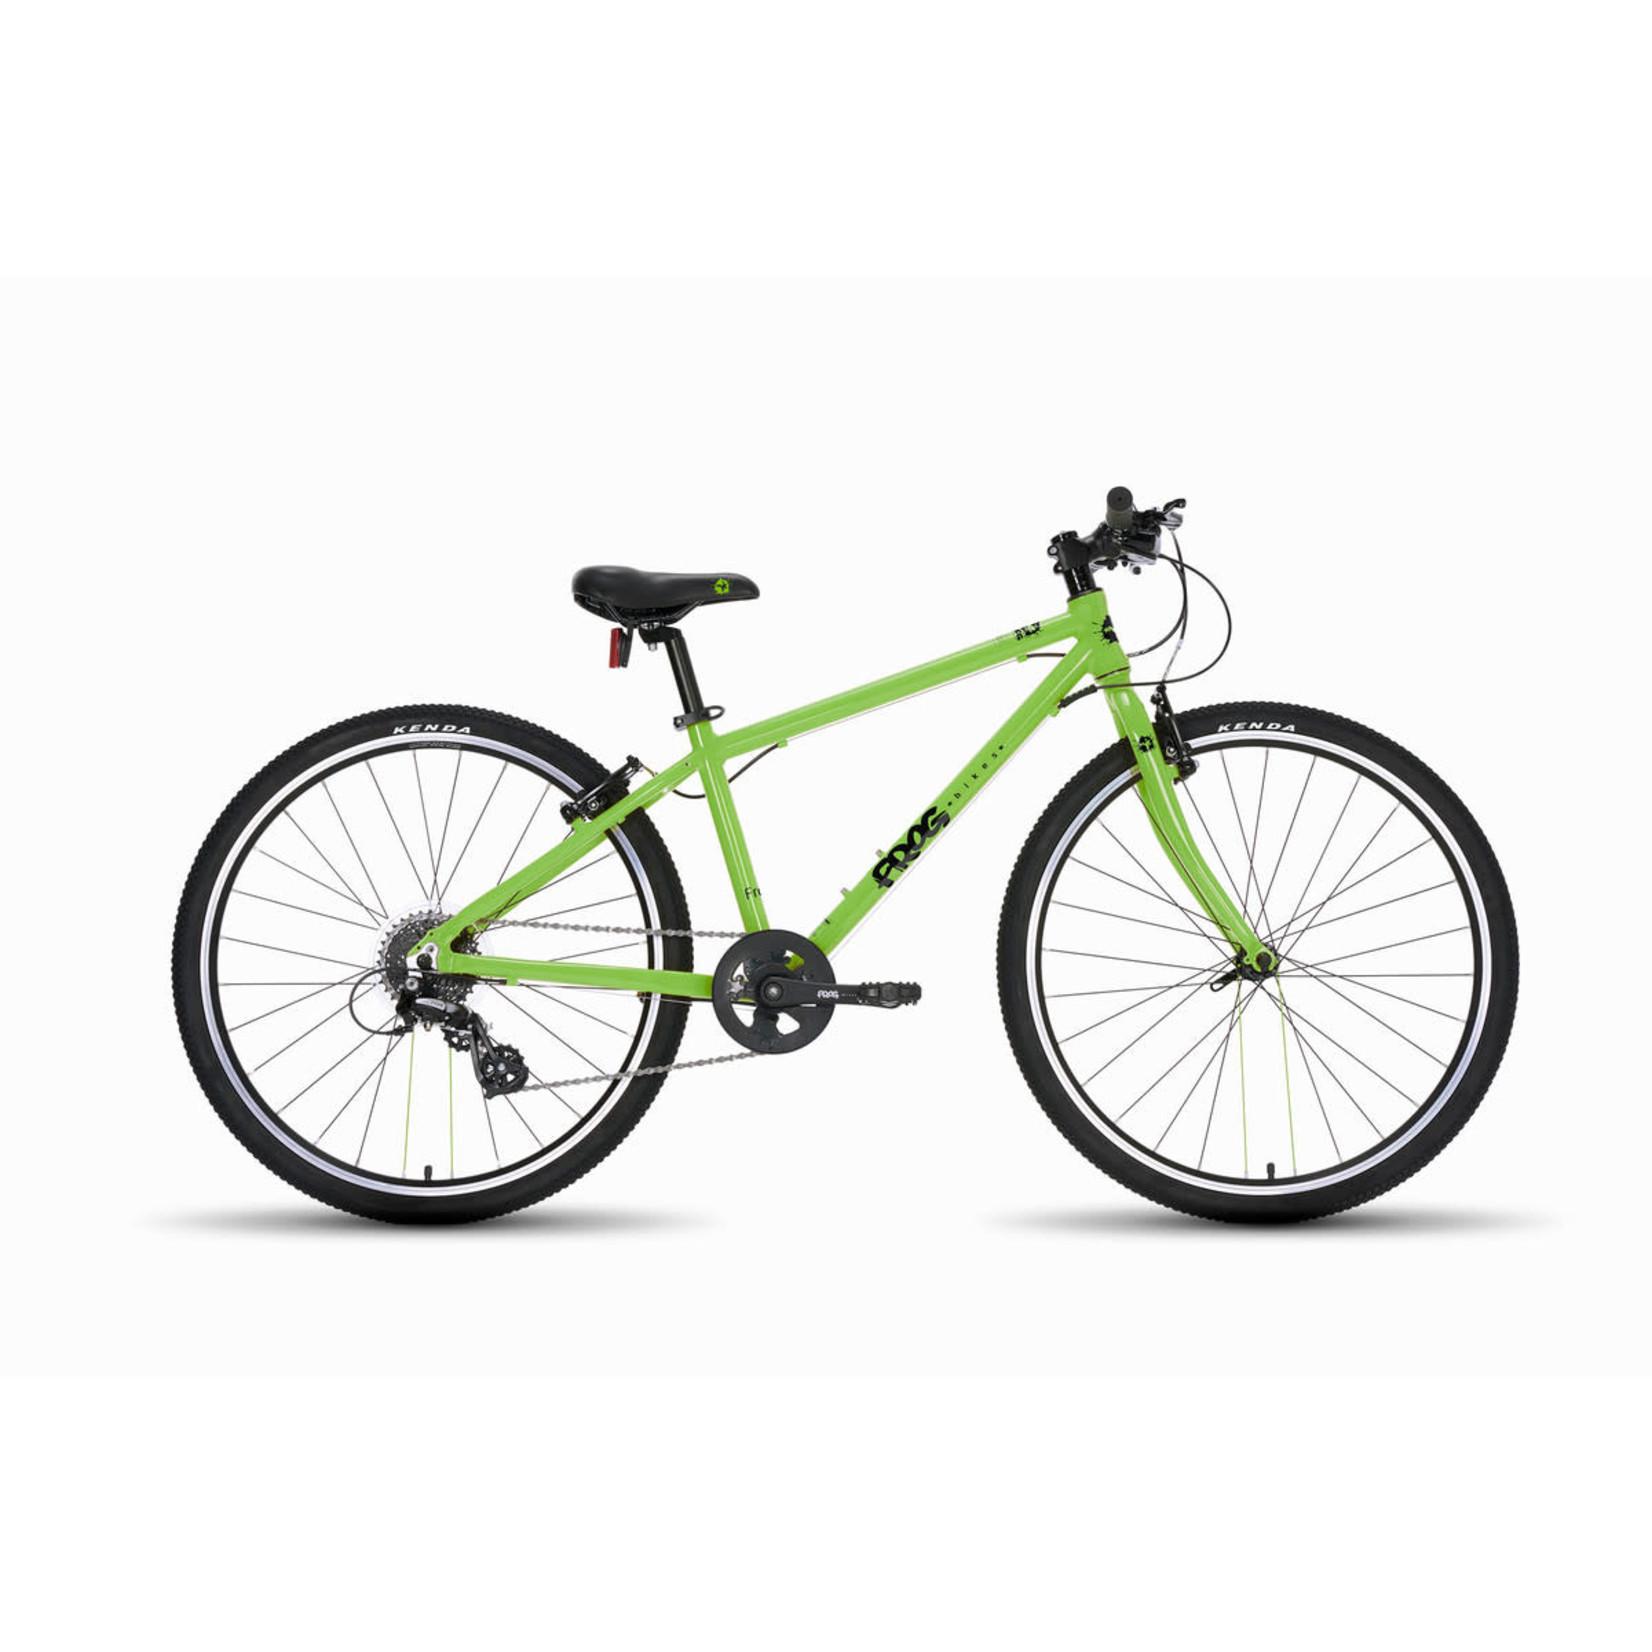 Frog Bikes 62 - Green